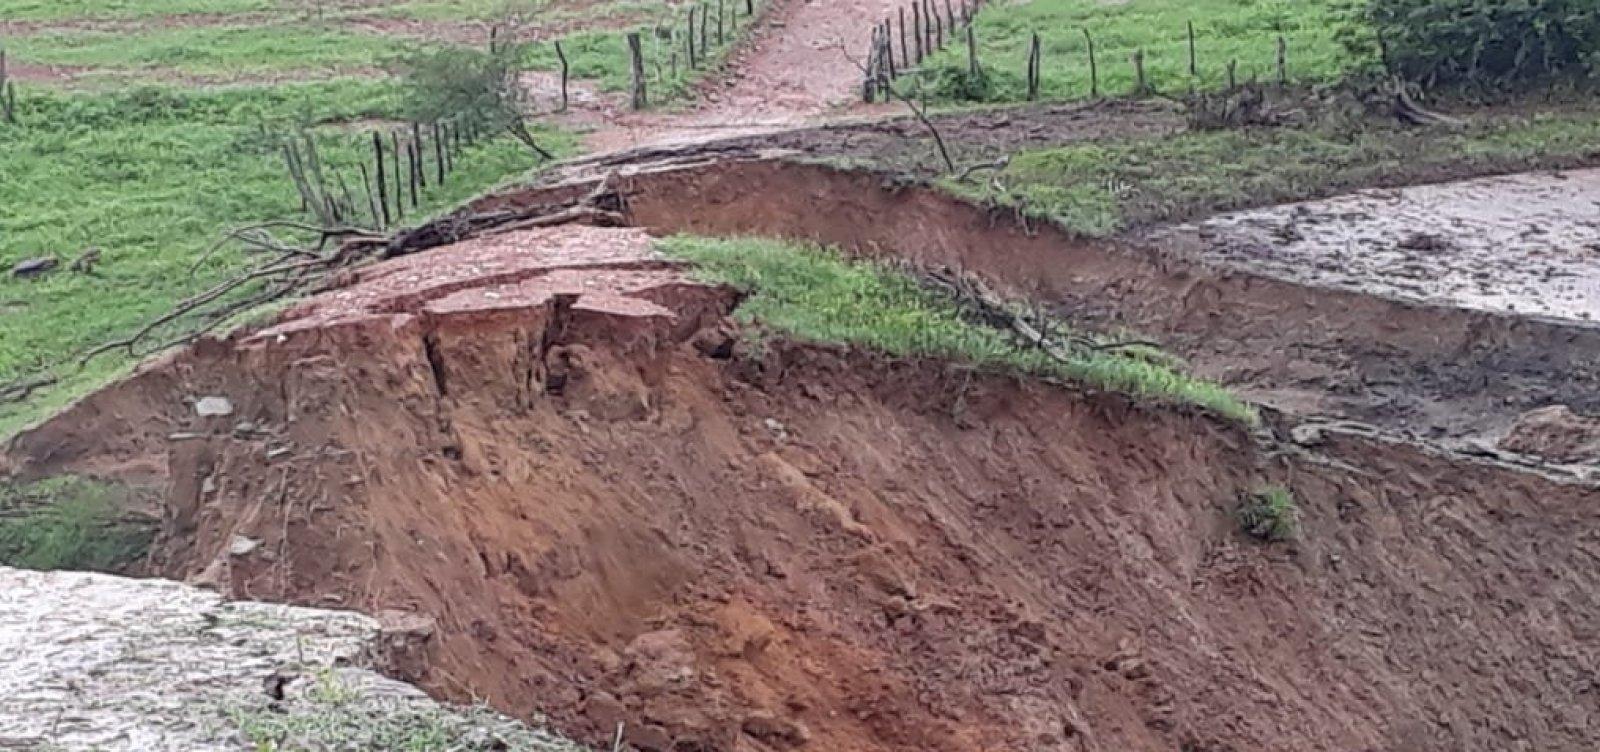 [Vídeo e foto mostram rompimento parcial de barragem em Pedro Alexandre]